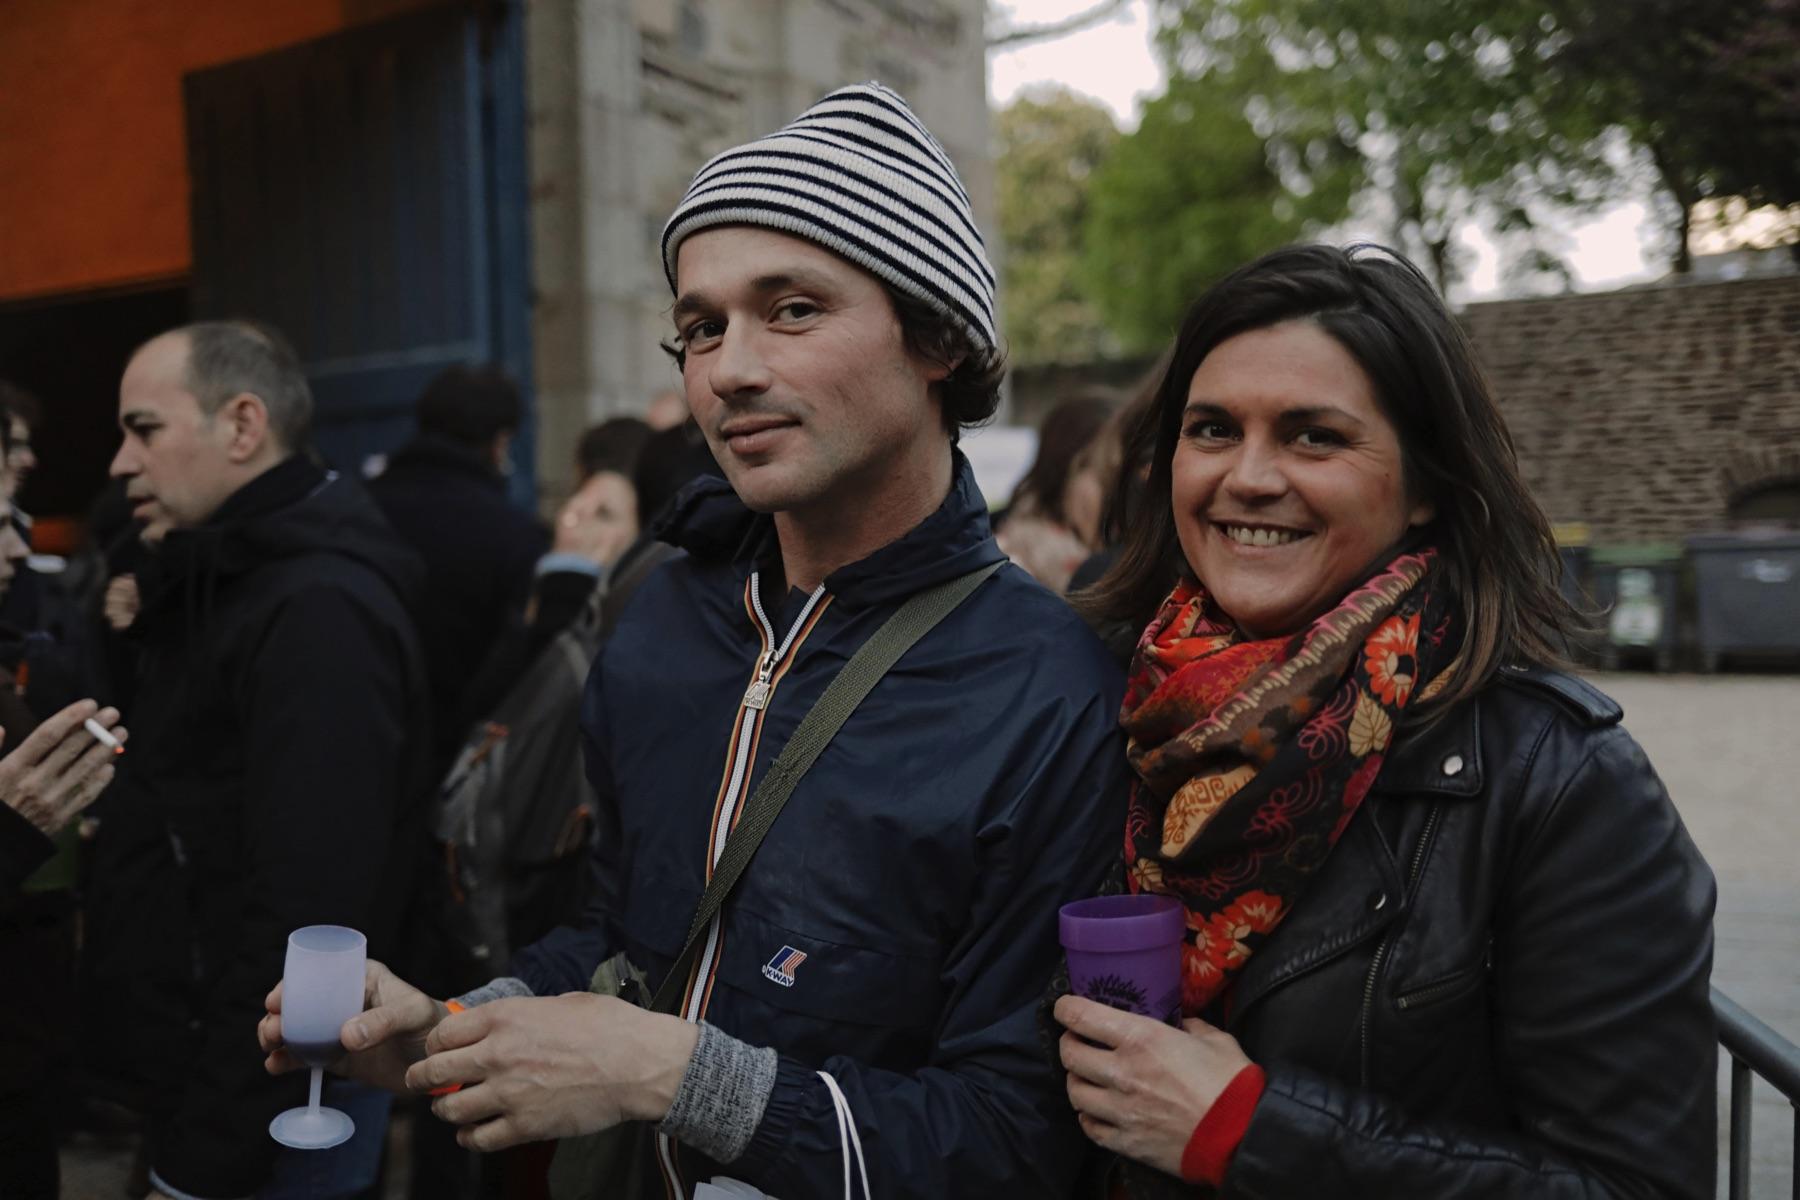 Festival Les Embellies 2019